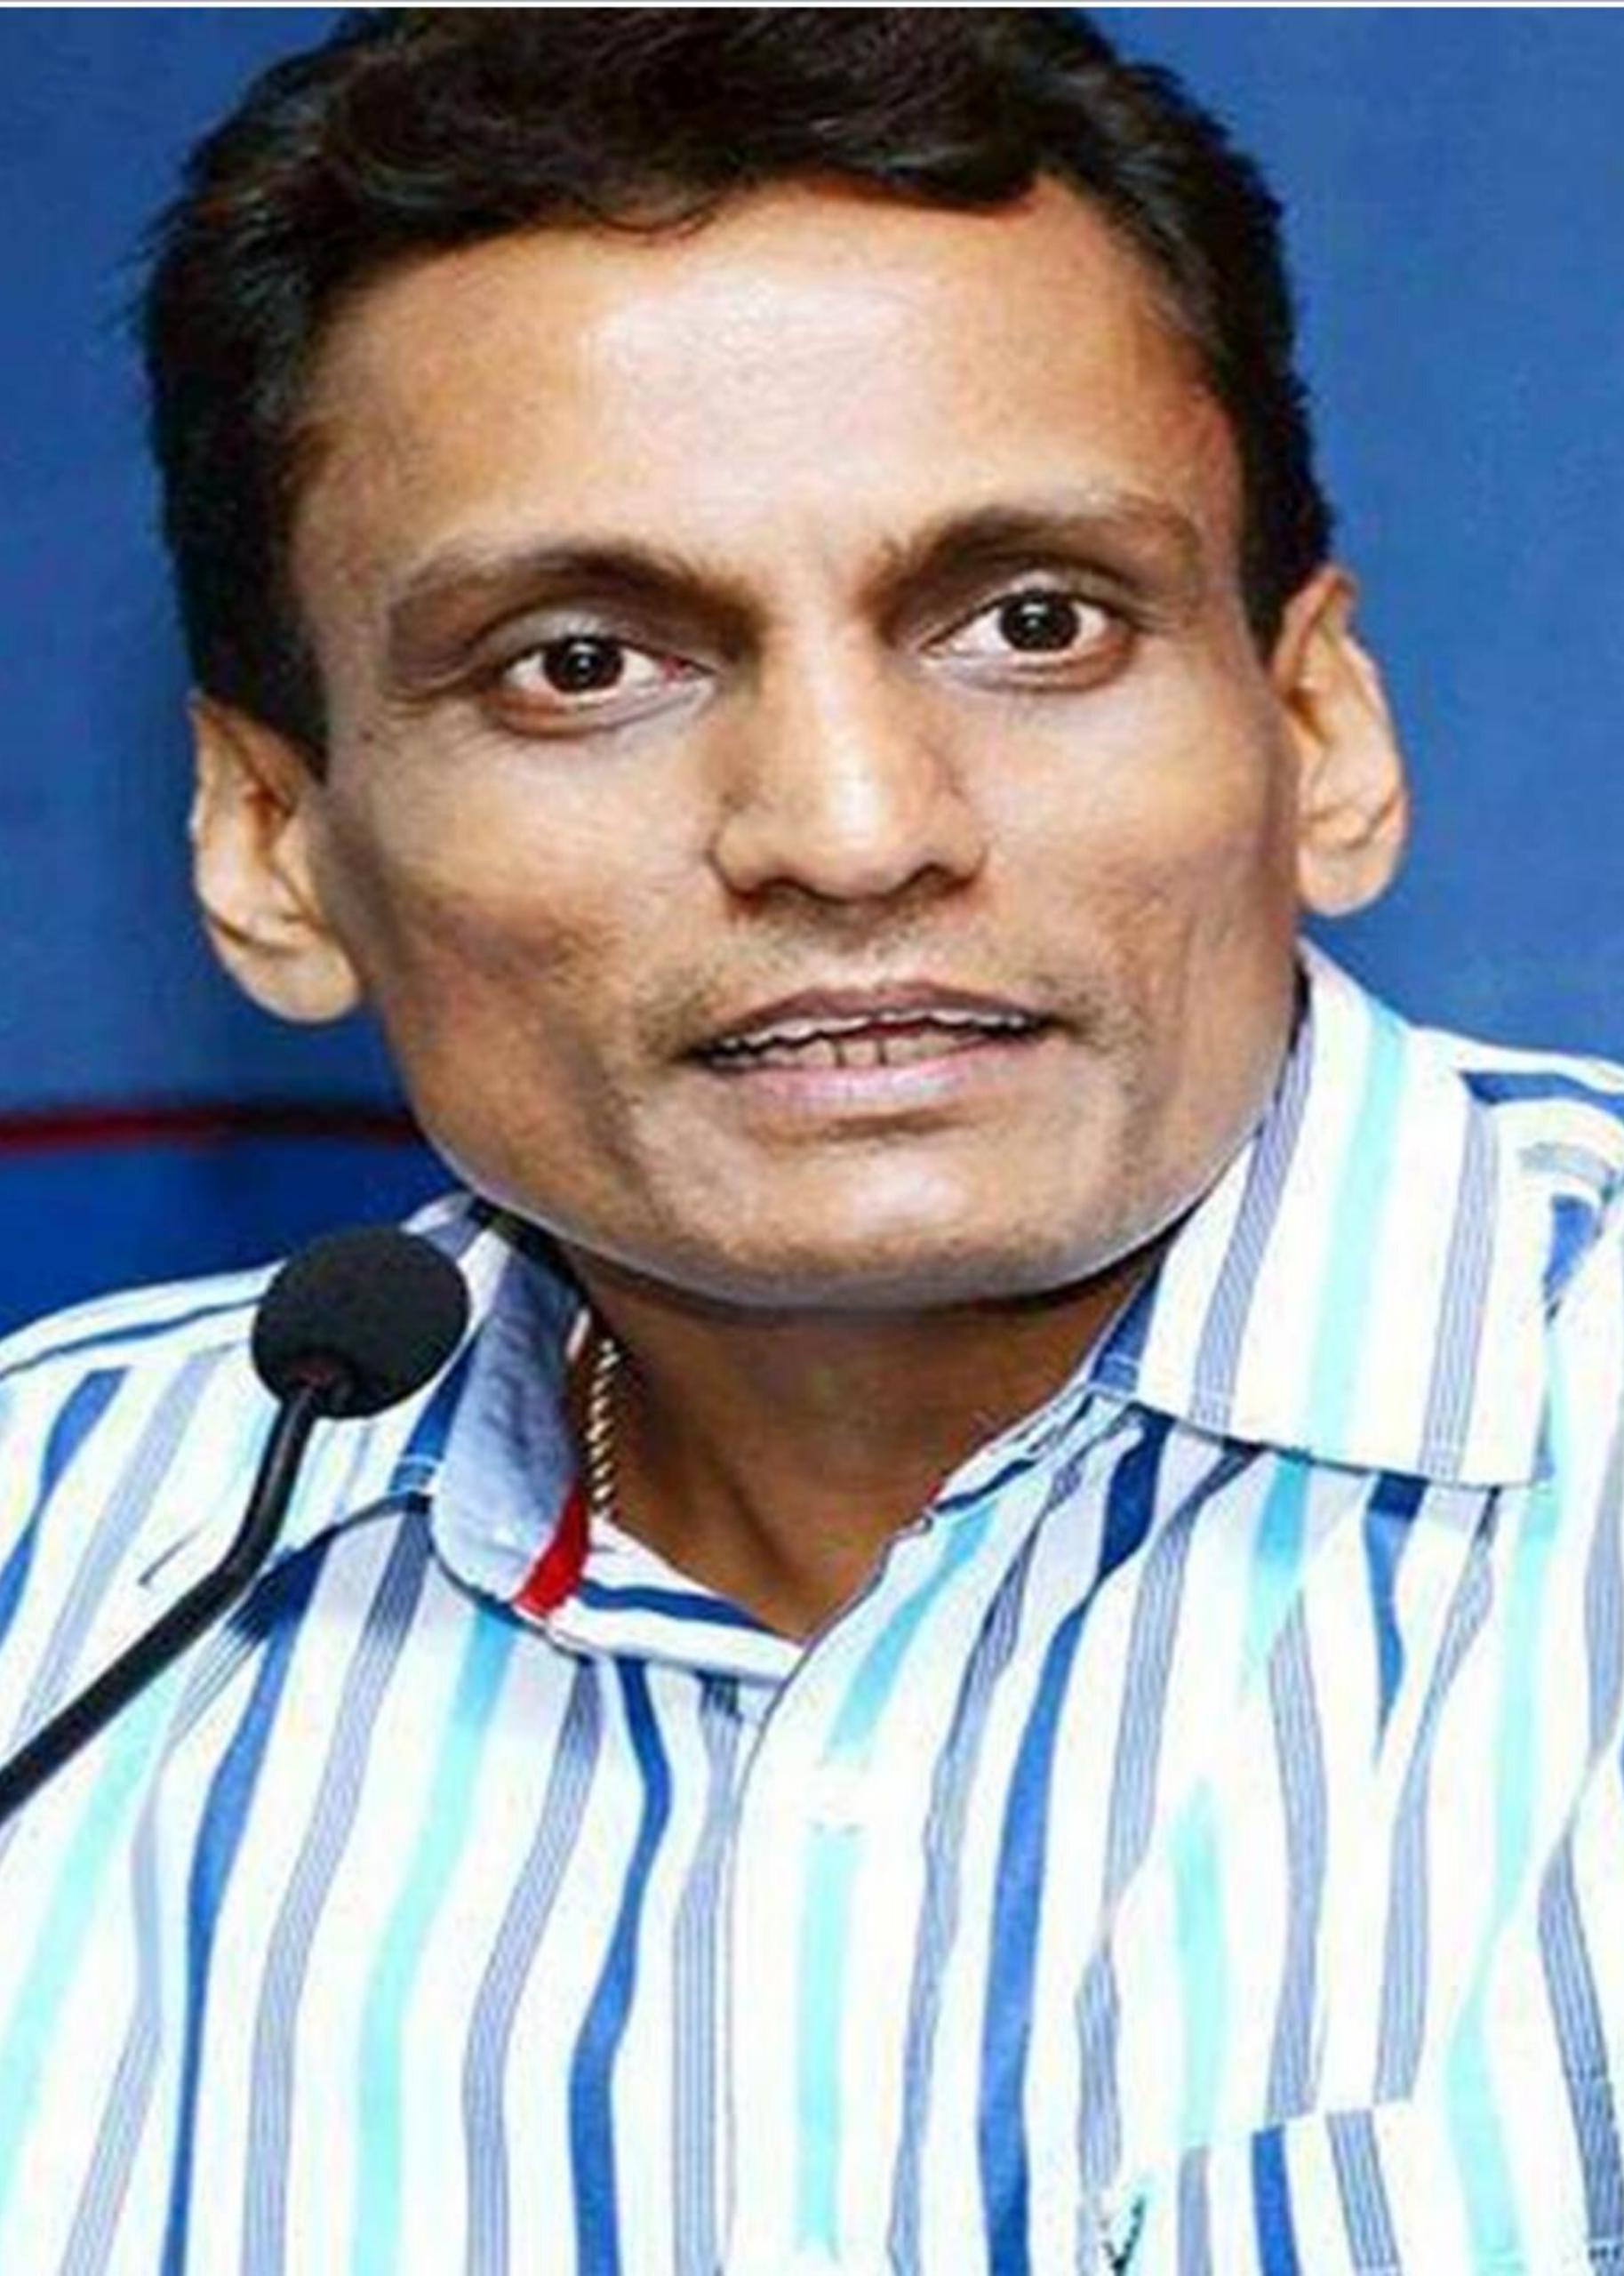 Sanjay-sir-ca-coaching-varanasi